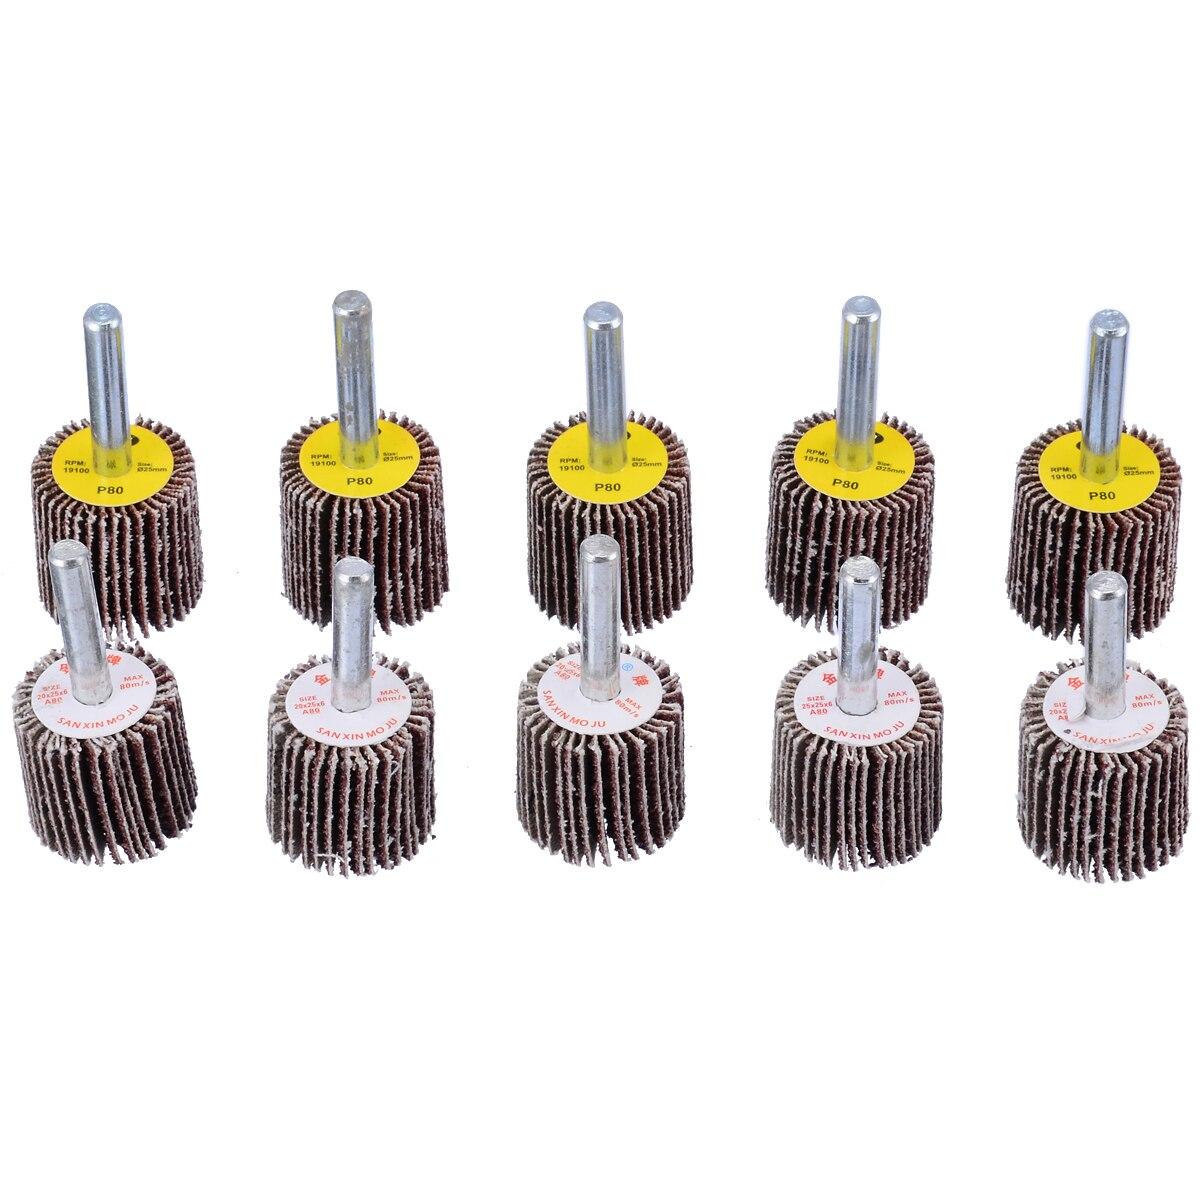 10Pcs 30KV 100P 100PF 101 high voltage ceramic capacitor 30KV 101K/_TEBE